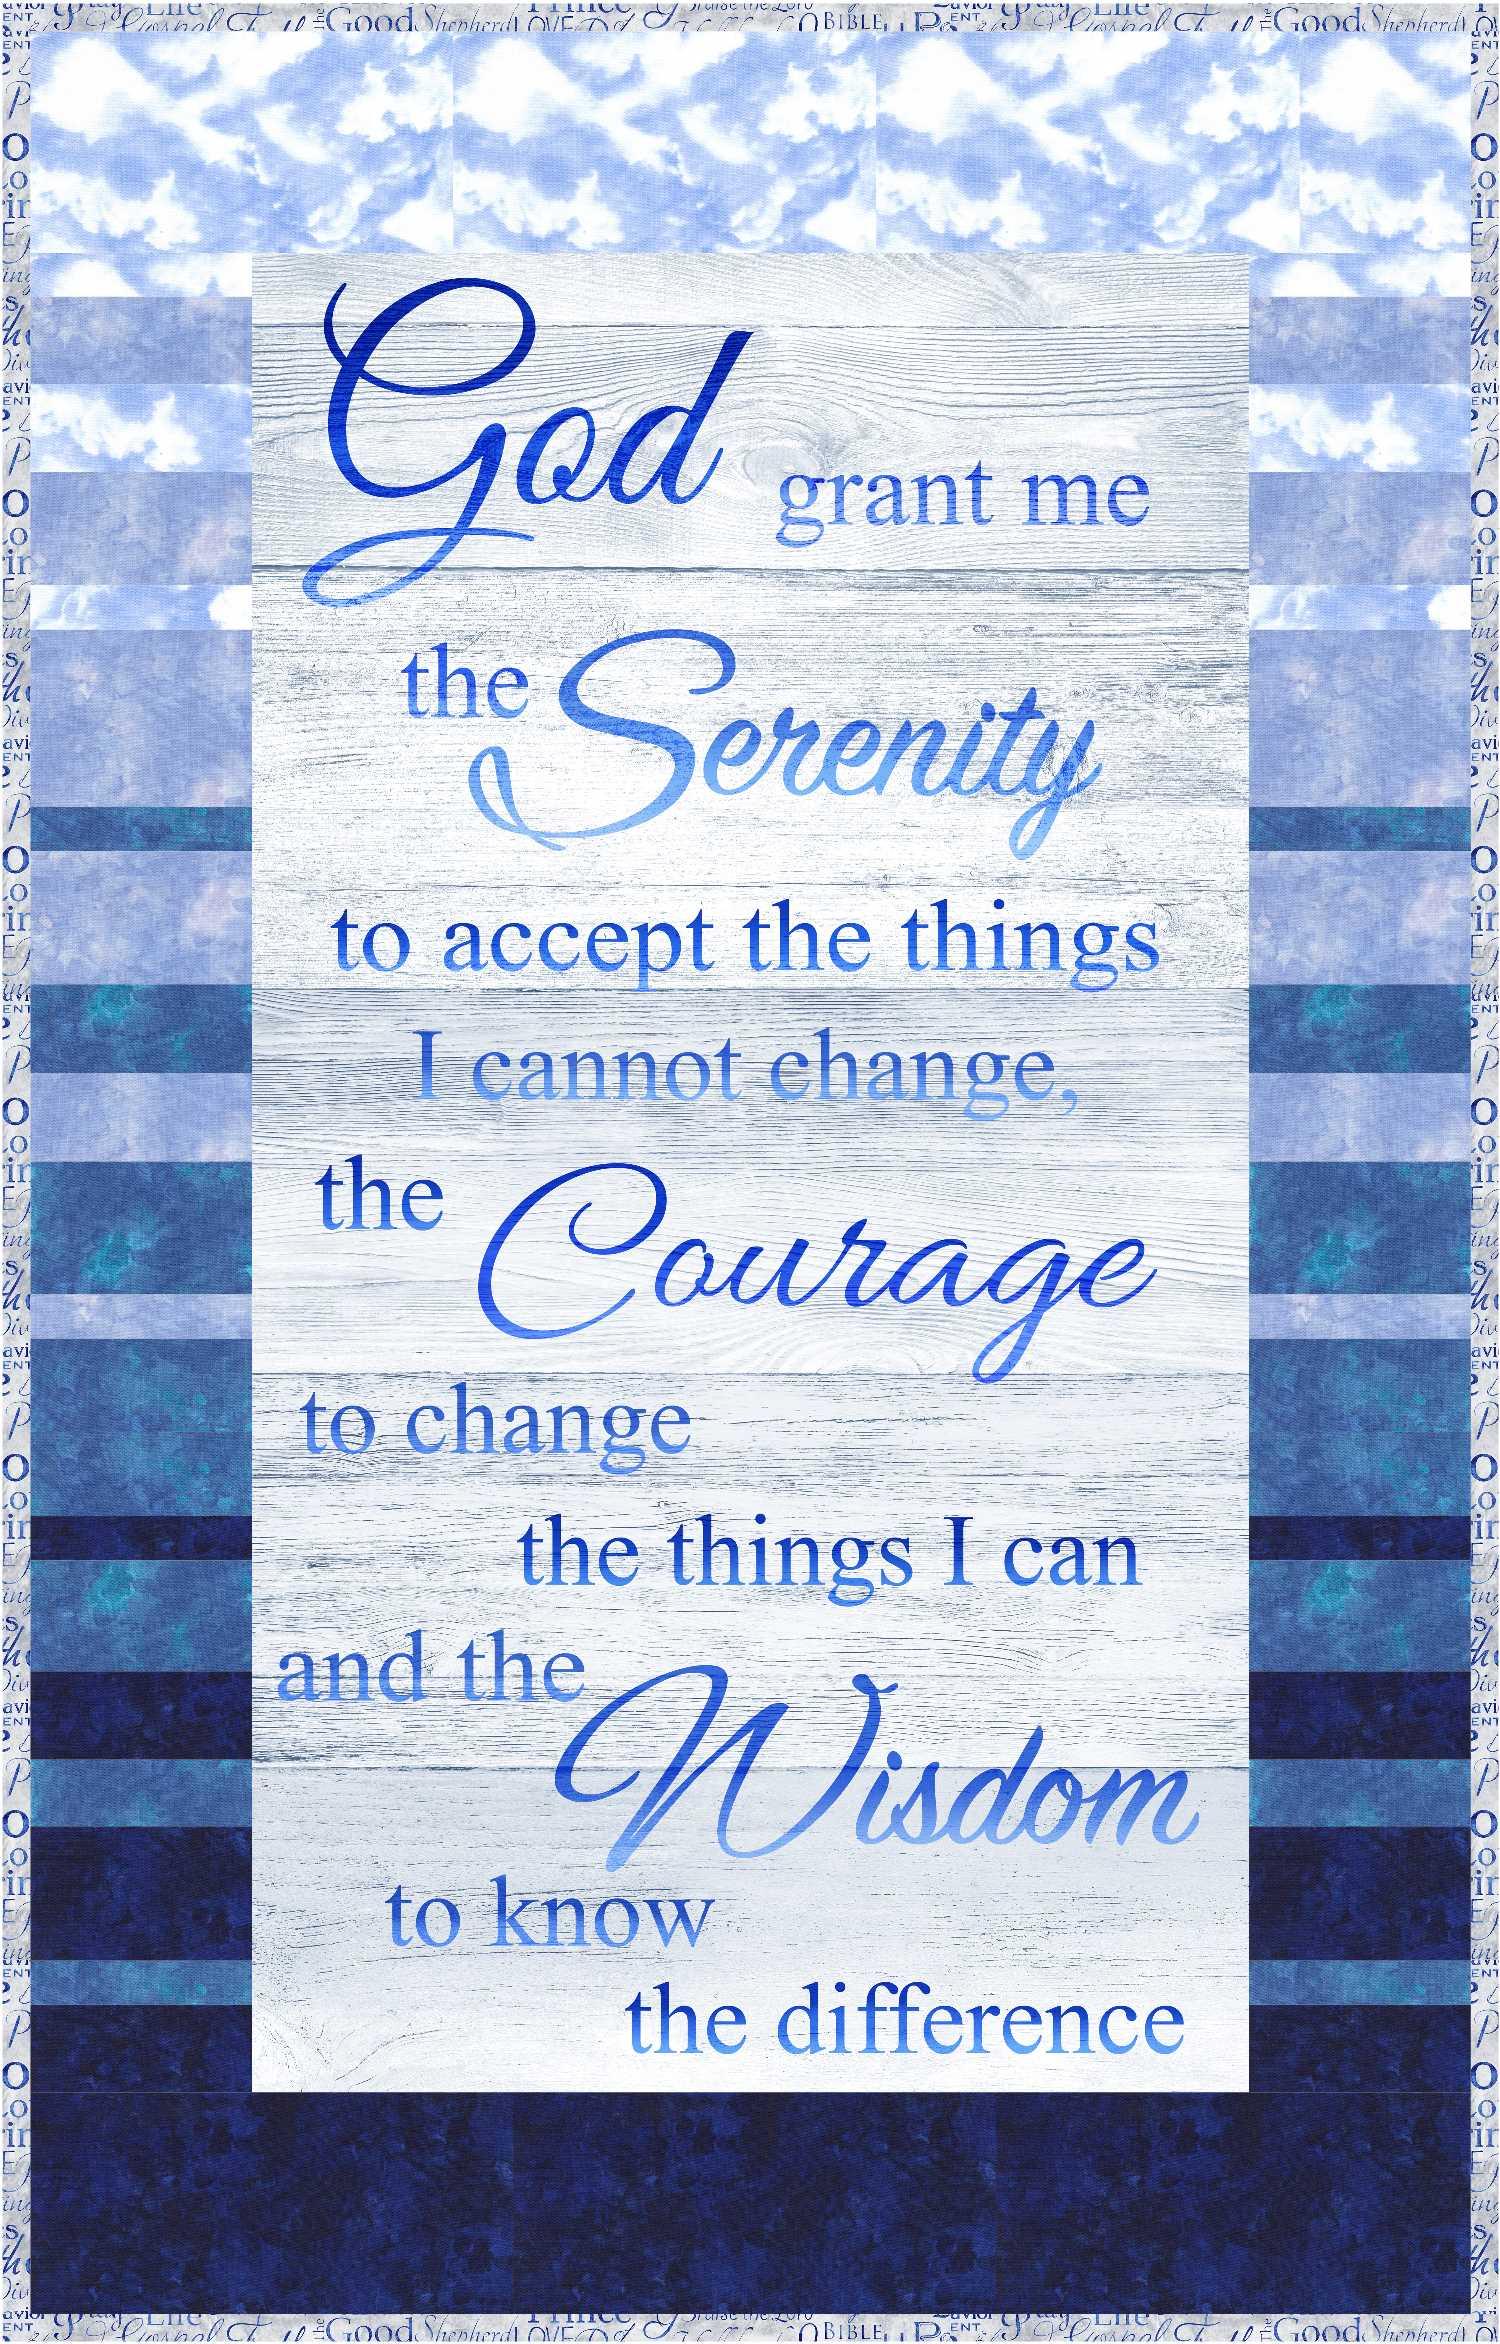 Serenity's Prayer Final 32 x 51 300 pixels.JPG